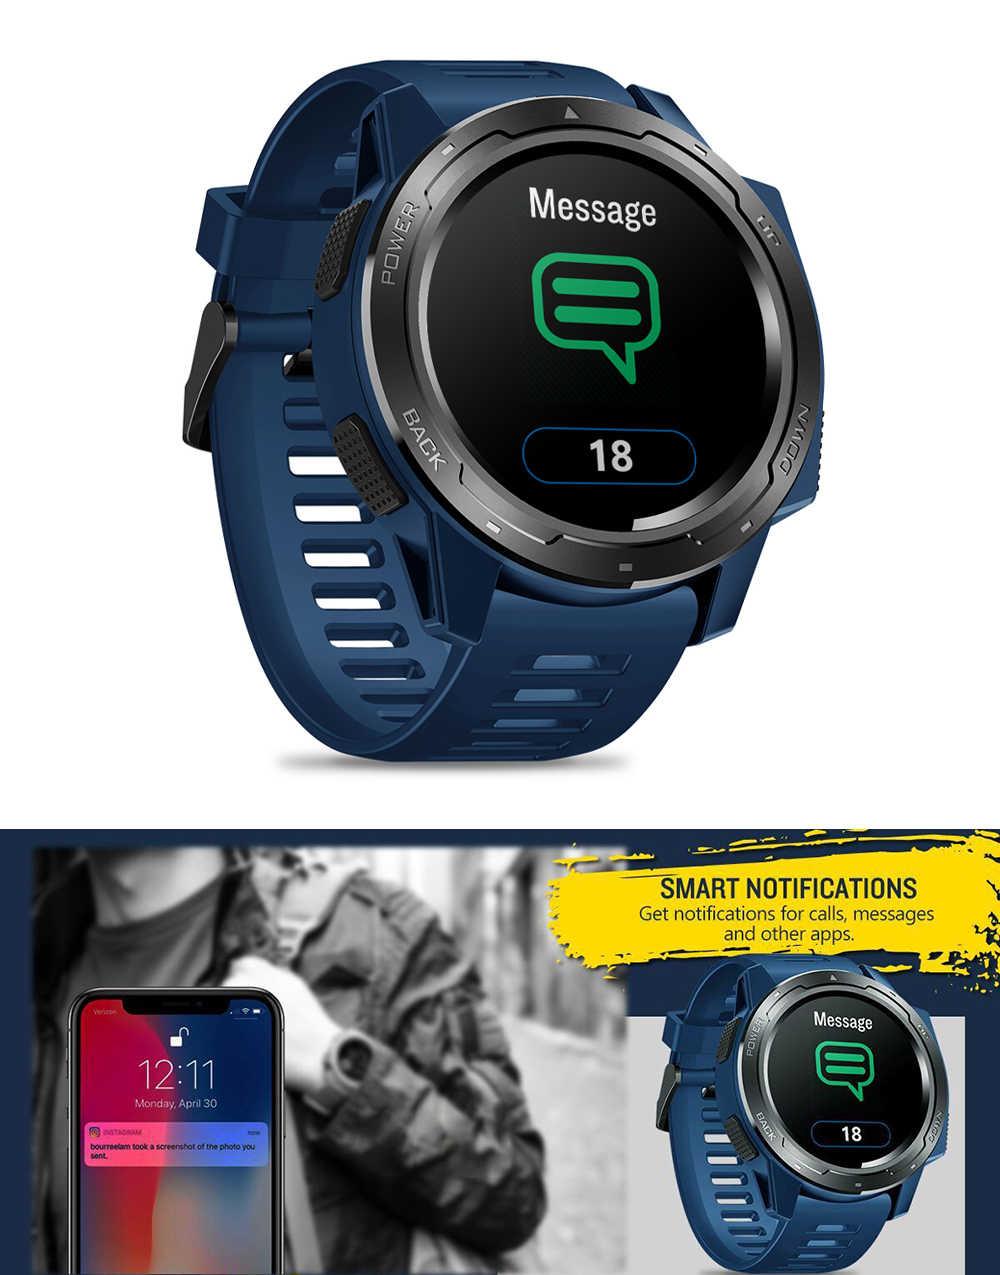 Zeblaze فيبي 5 ساعة ذكية الرجال 1.3 شاشة ملونة عداد الخطى سوار لياقة بدنية المقتفي IP67 مقاوم للماء مراقب معدل ضربات القلب Smartwatch